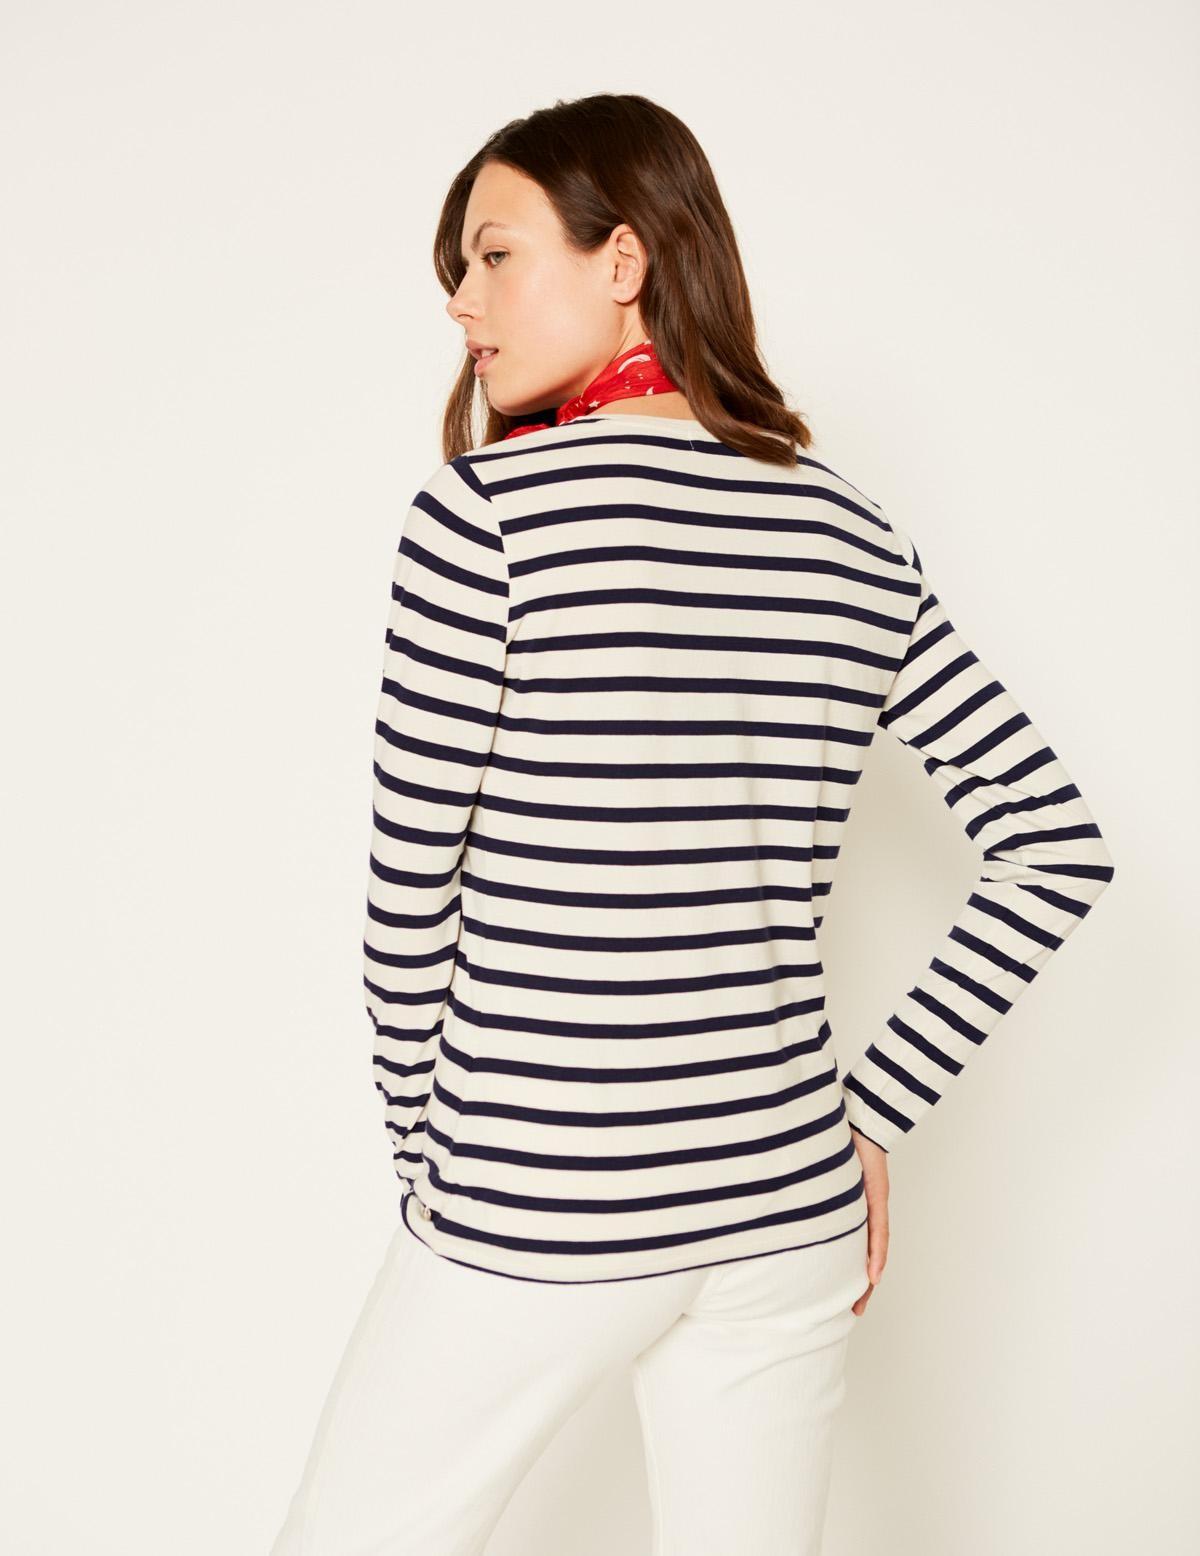 Camiseta rayas marineras - Ítem2